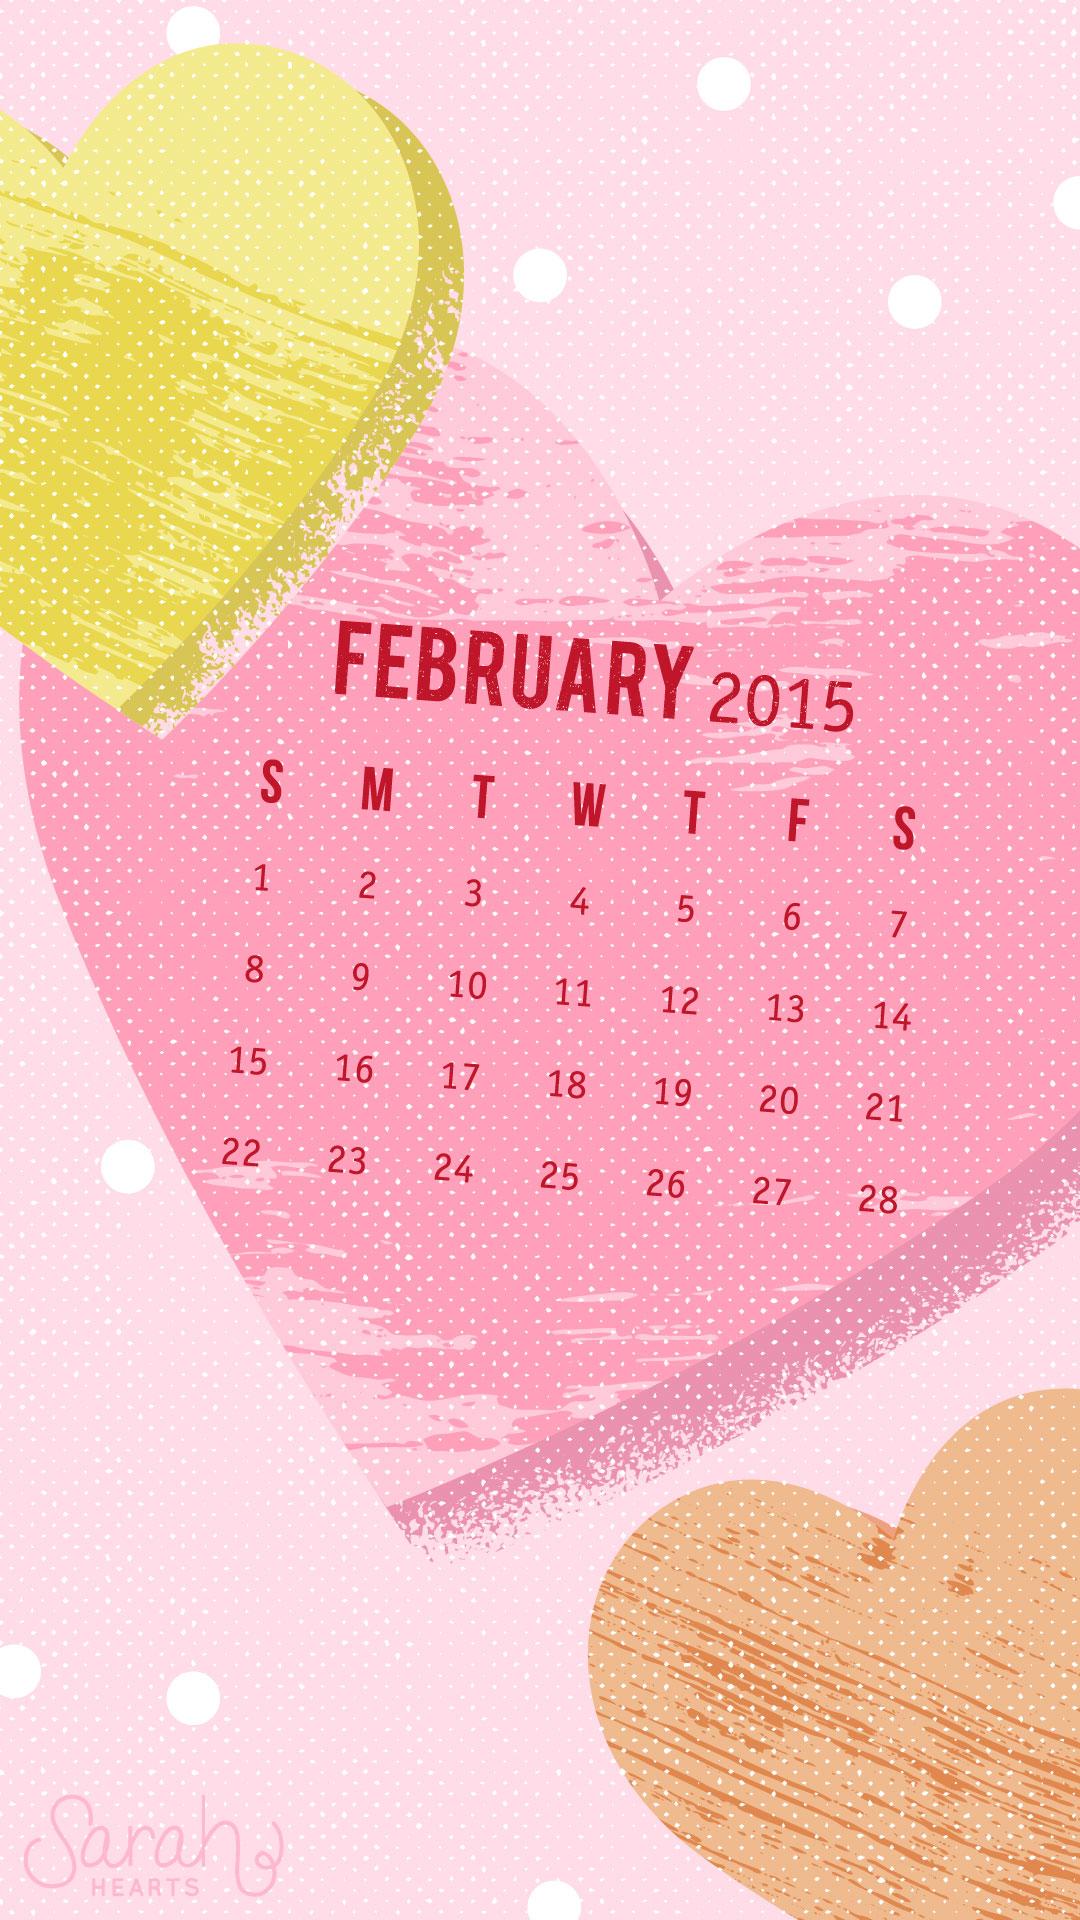 Uglovoj M Sajt further Ugs further Palodurocancelled as well Feb Calendar Plus together with Charter Newcallcentre. on february 2015 calendar